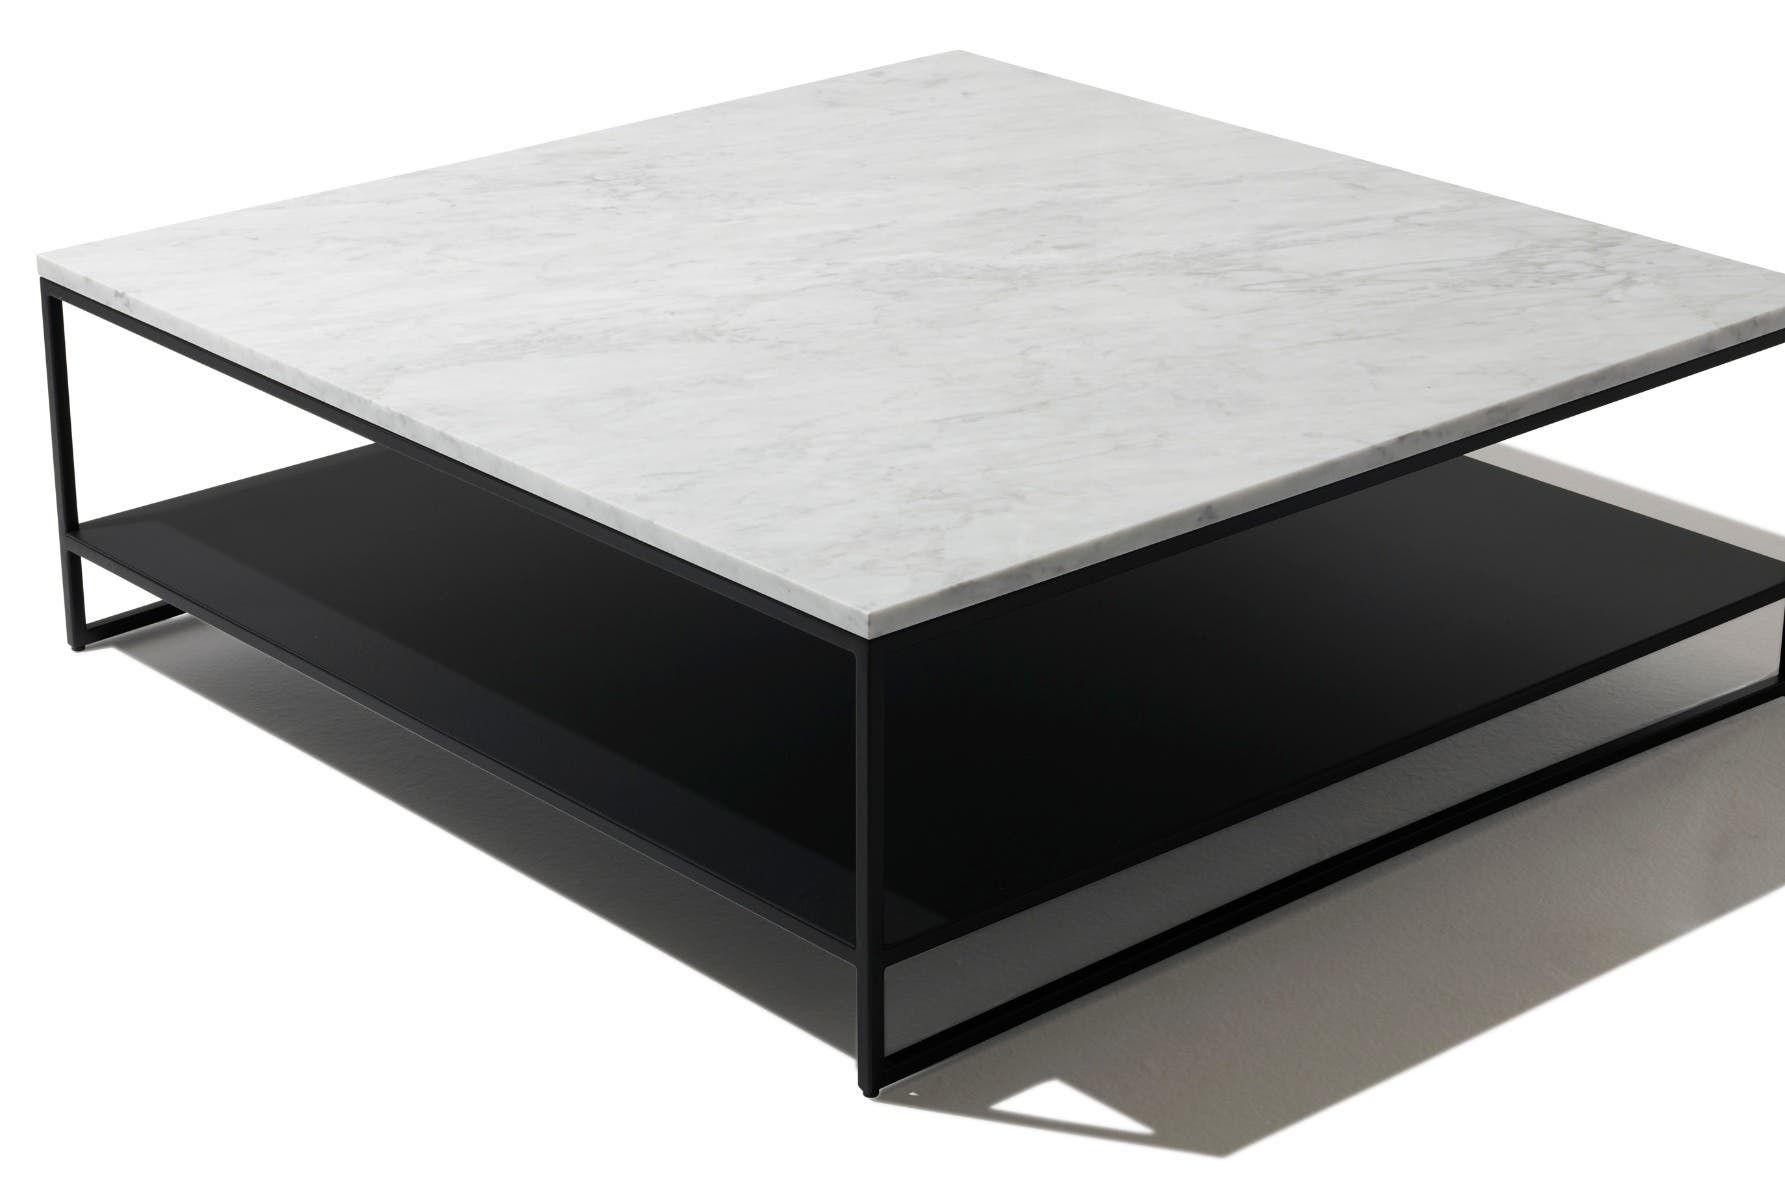 Carrera Coffee Table Square In 2021 Coffee Table Square Coffee Table Modern Square Coffee Table